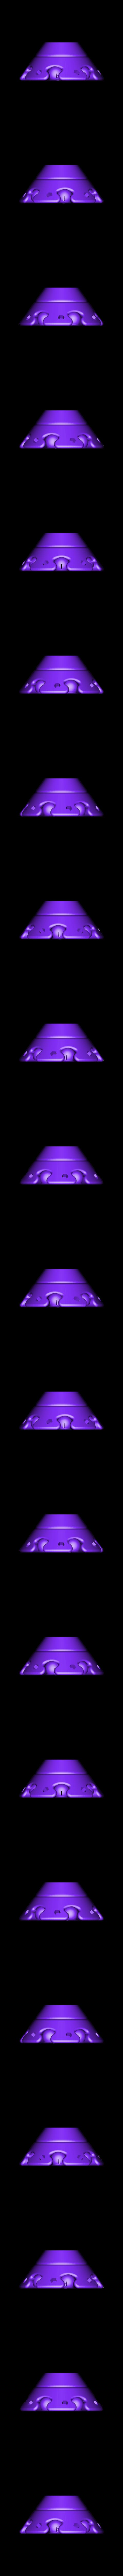 base_plain_botwg3.stl Download free STL file Guardian Robot Hackable – Bottom Remix • 3D print object, Adafruit